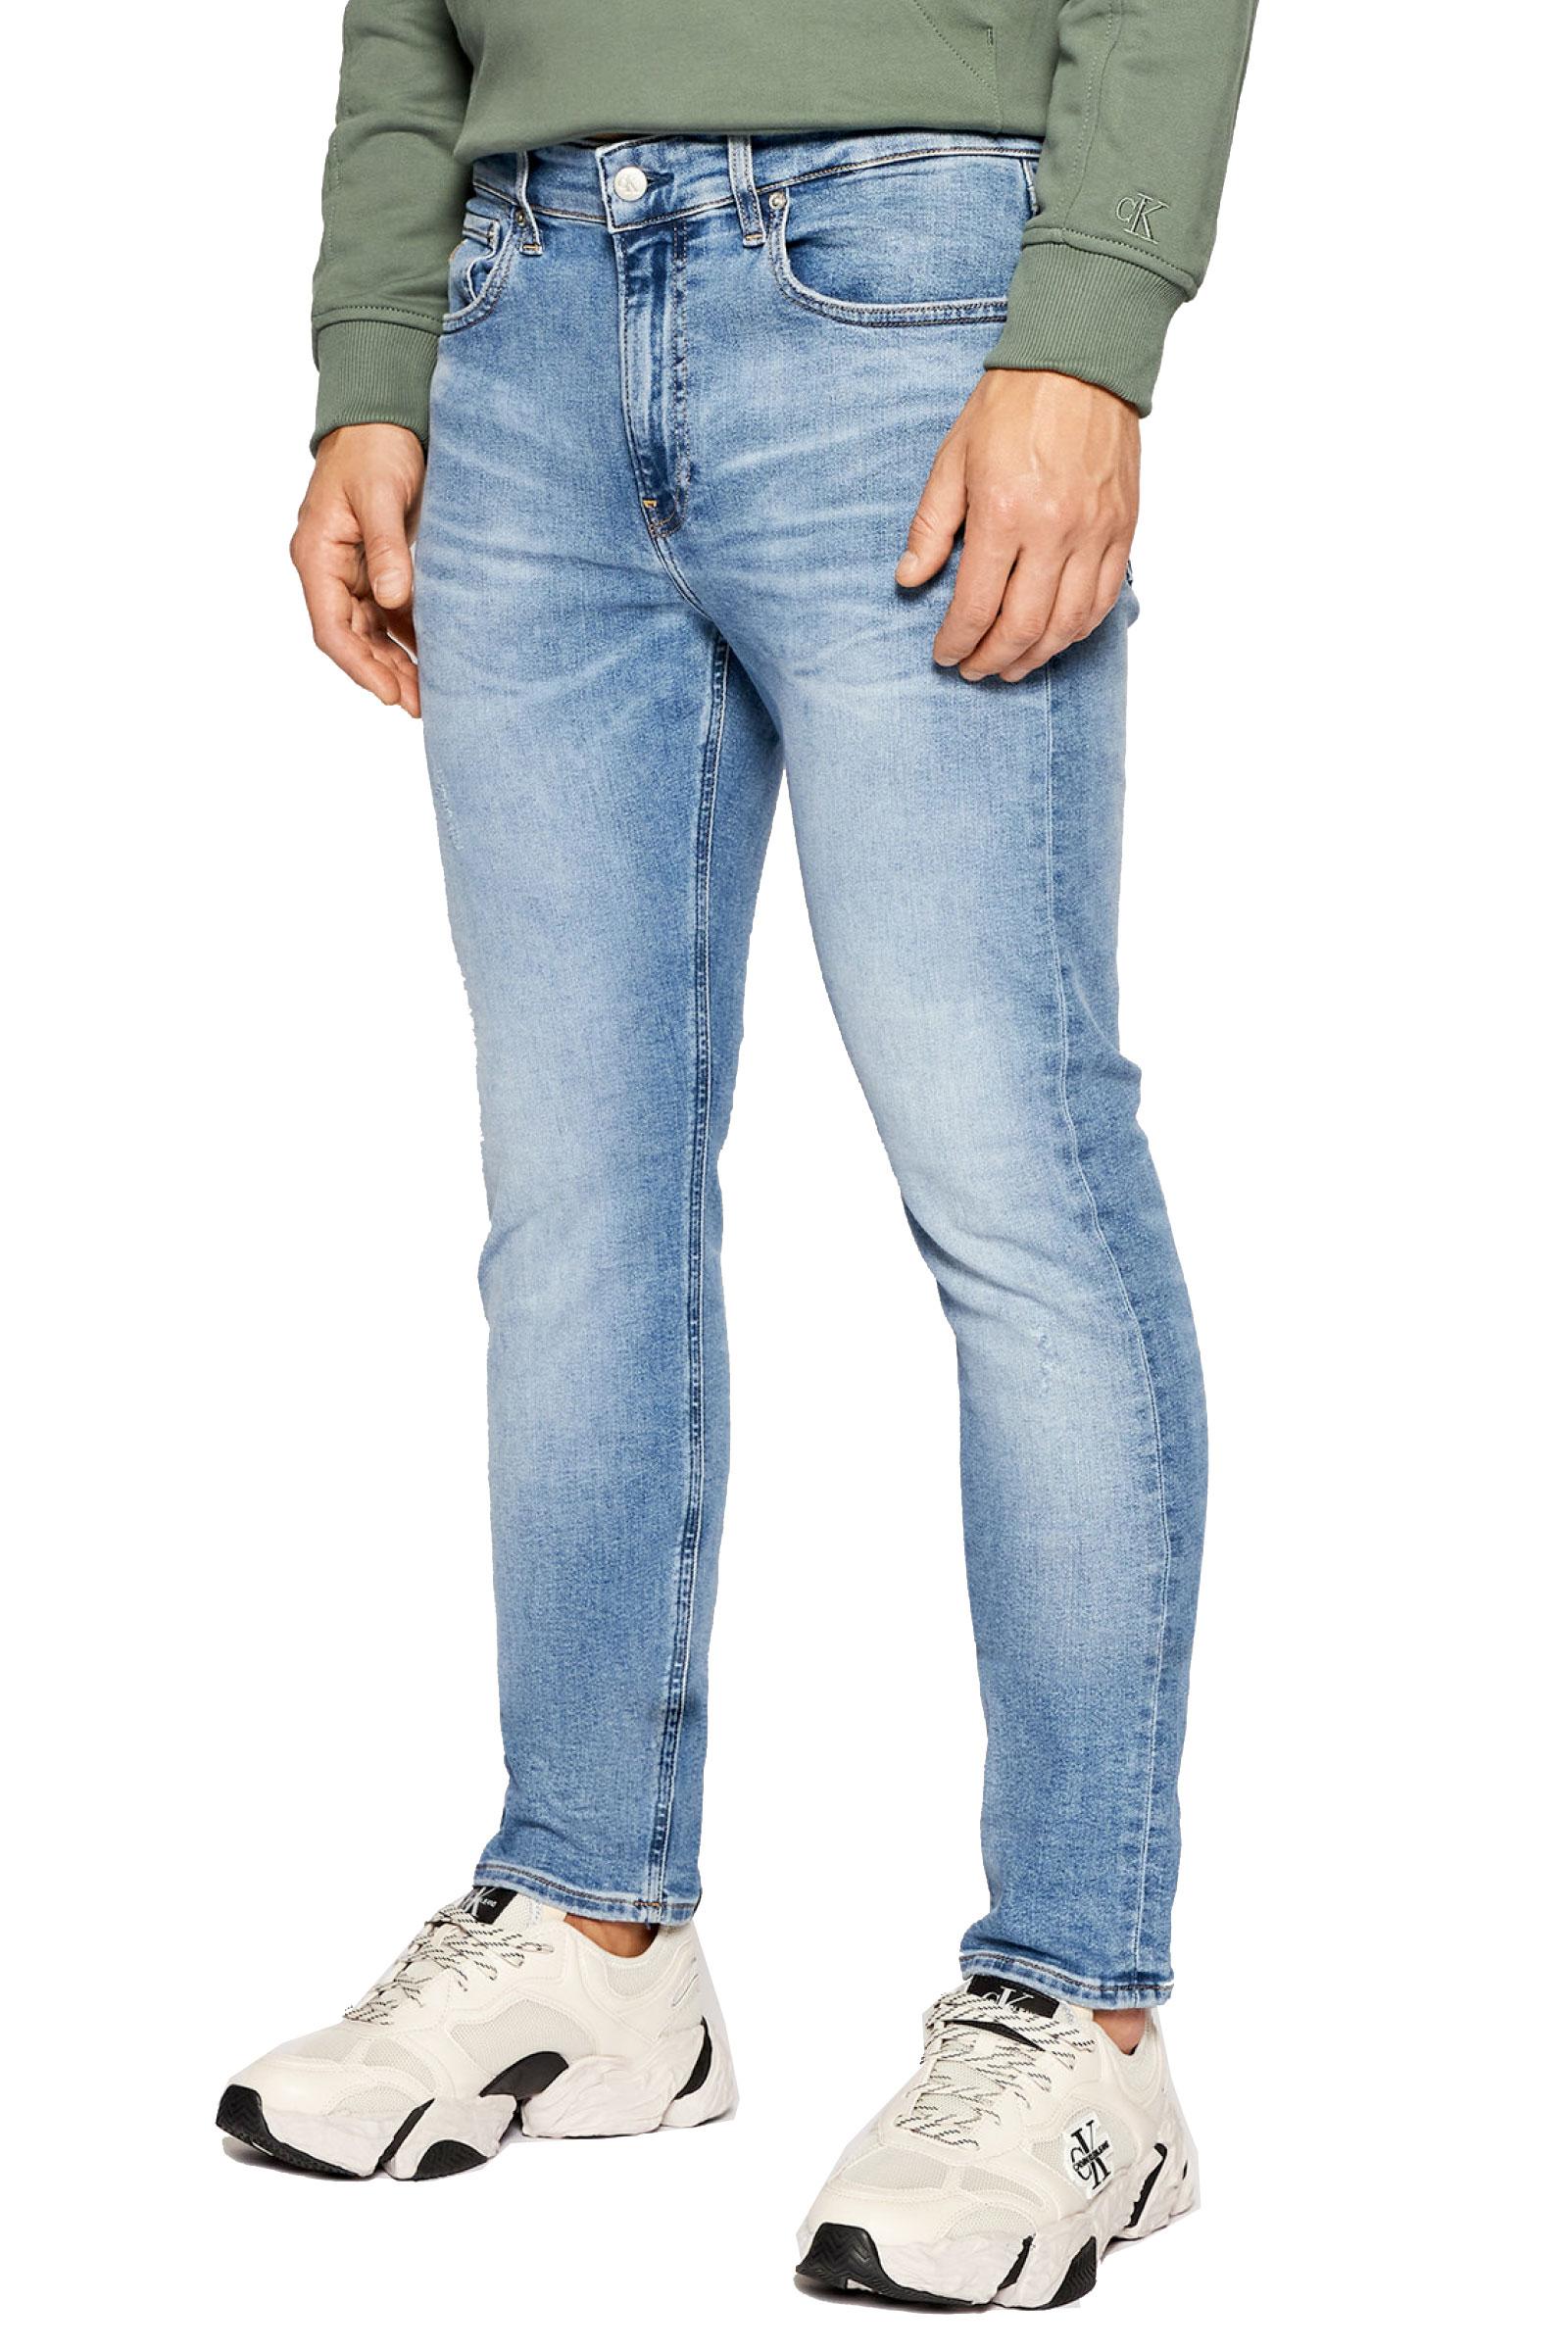 CALVIN KLEIN JEANS | Jeans | J30J3182461A4